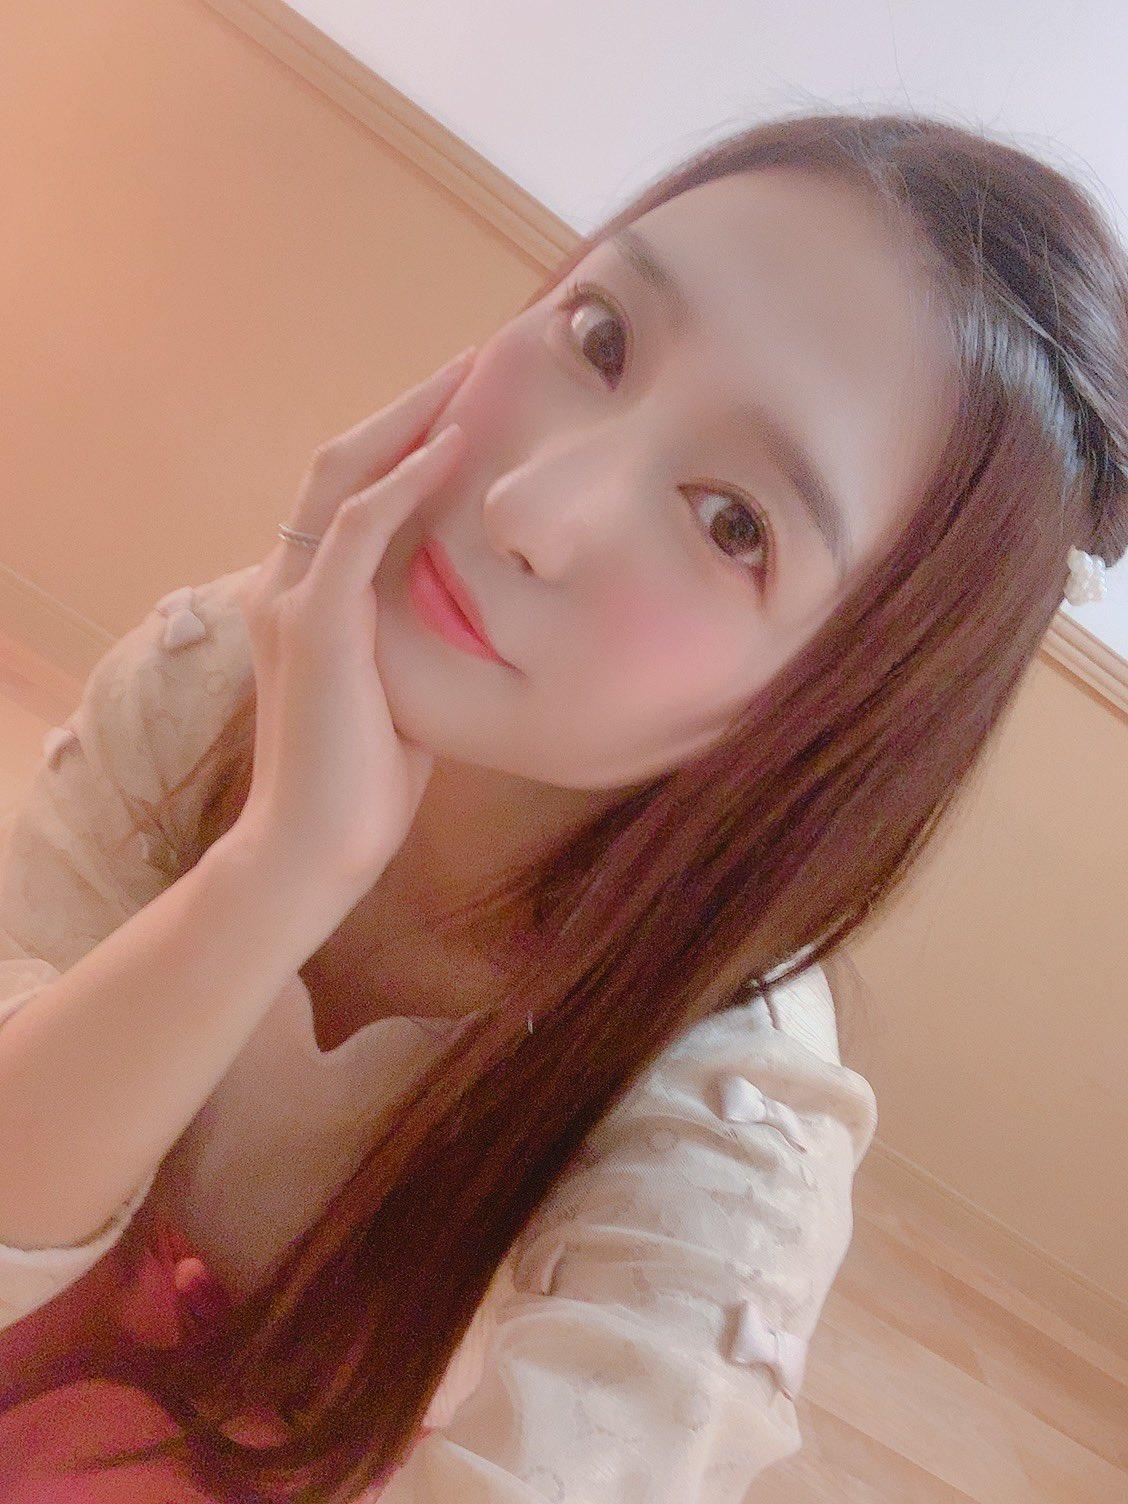 kogawaiori 1184777270201741312_p0